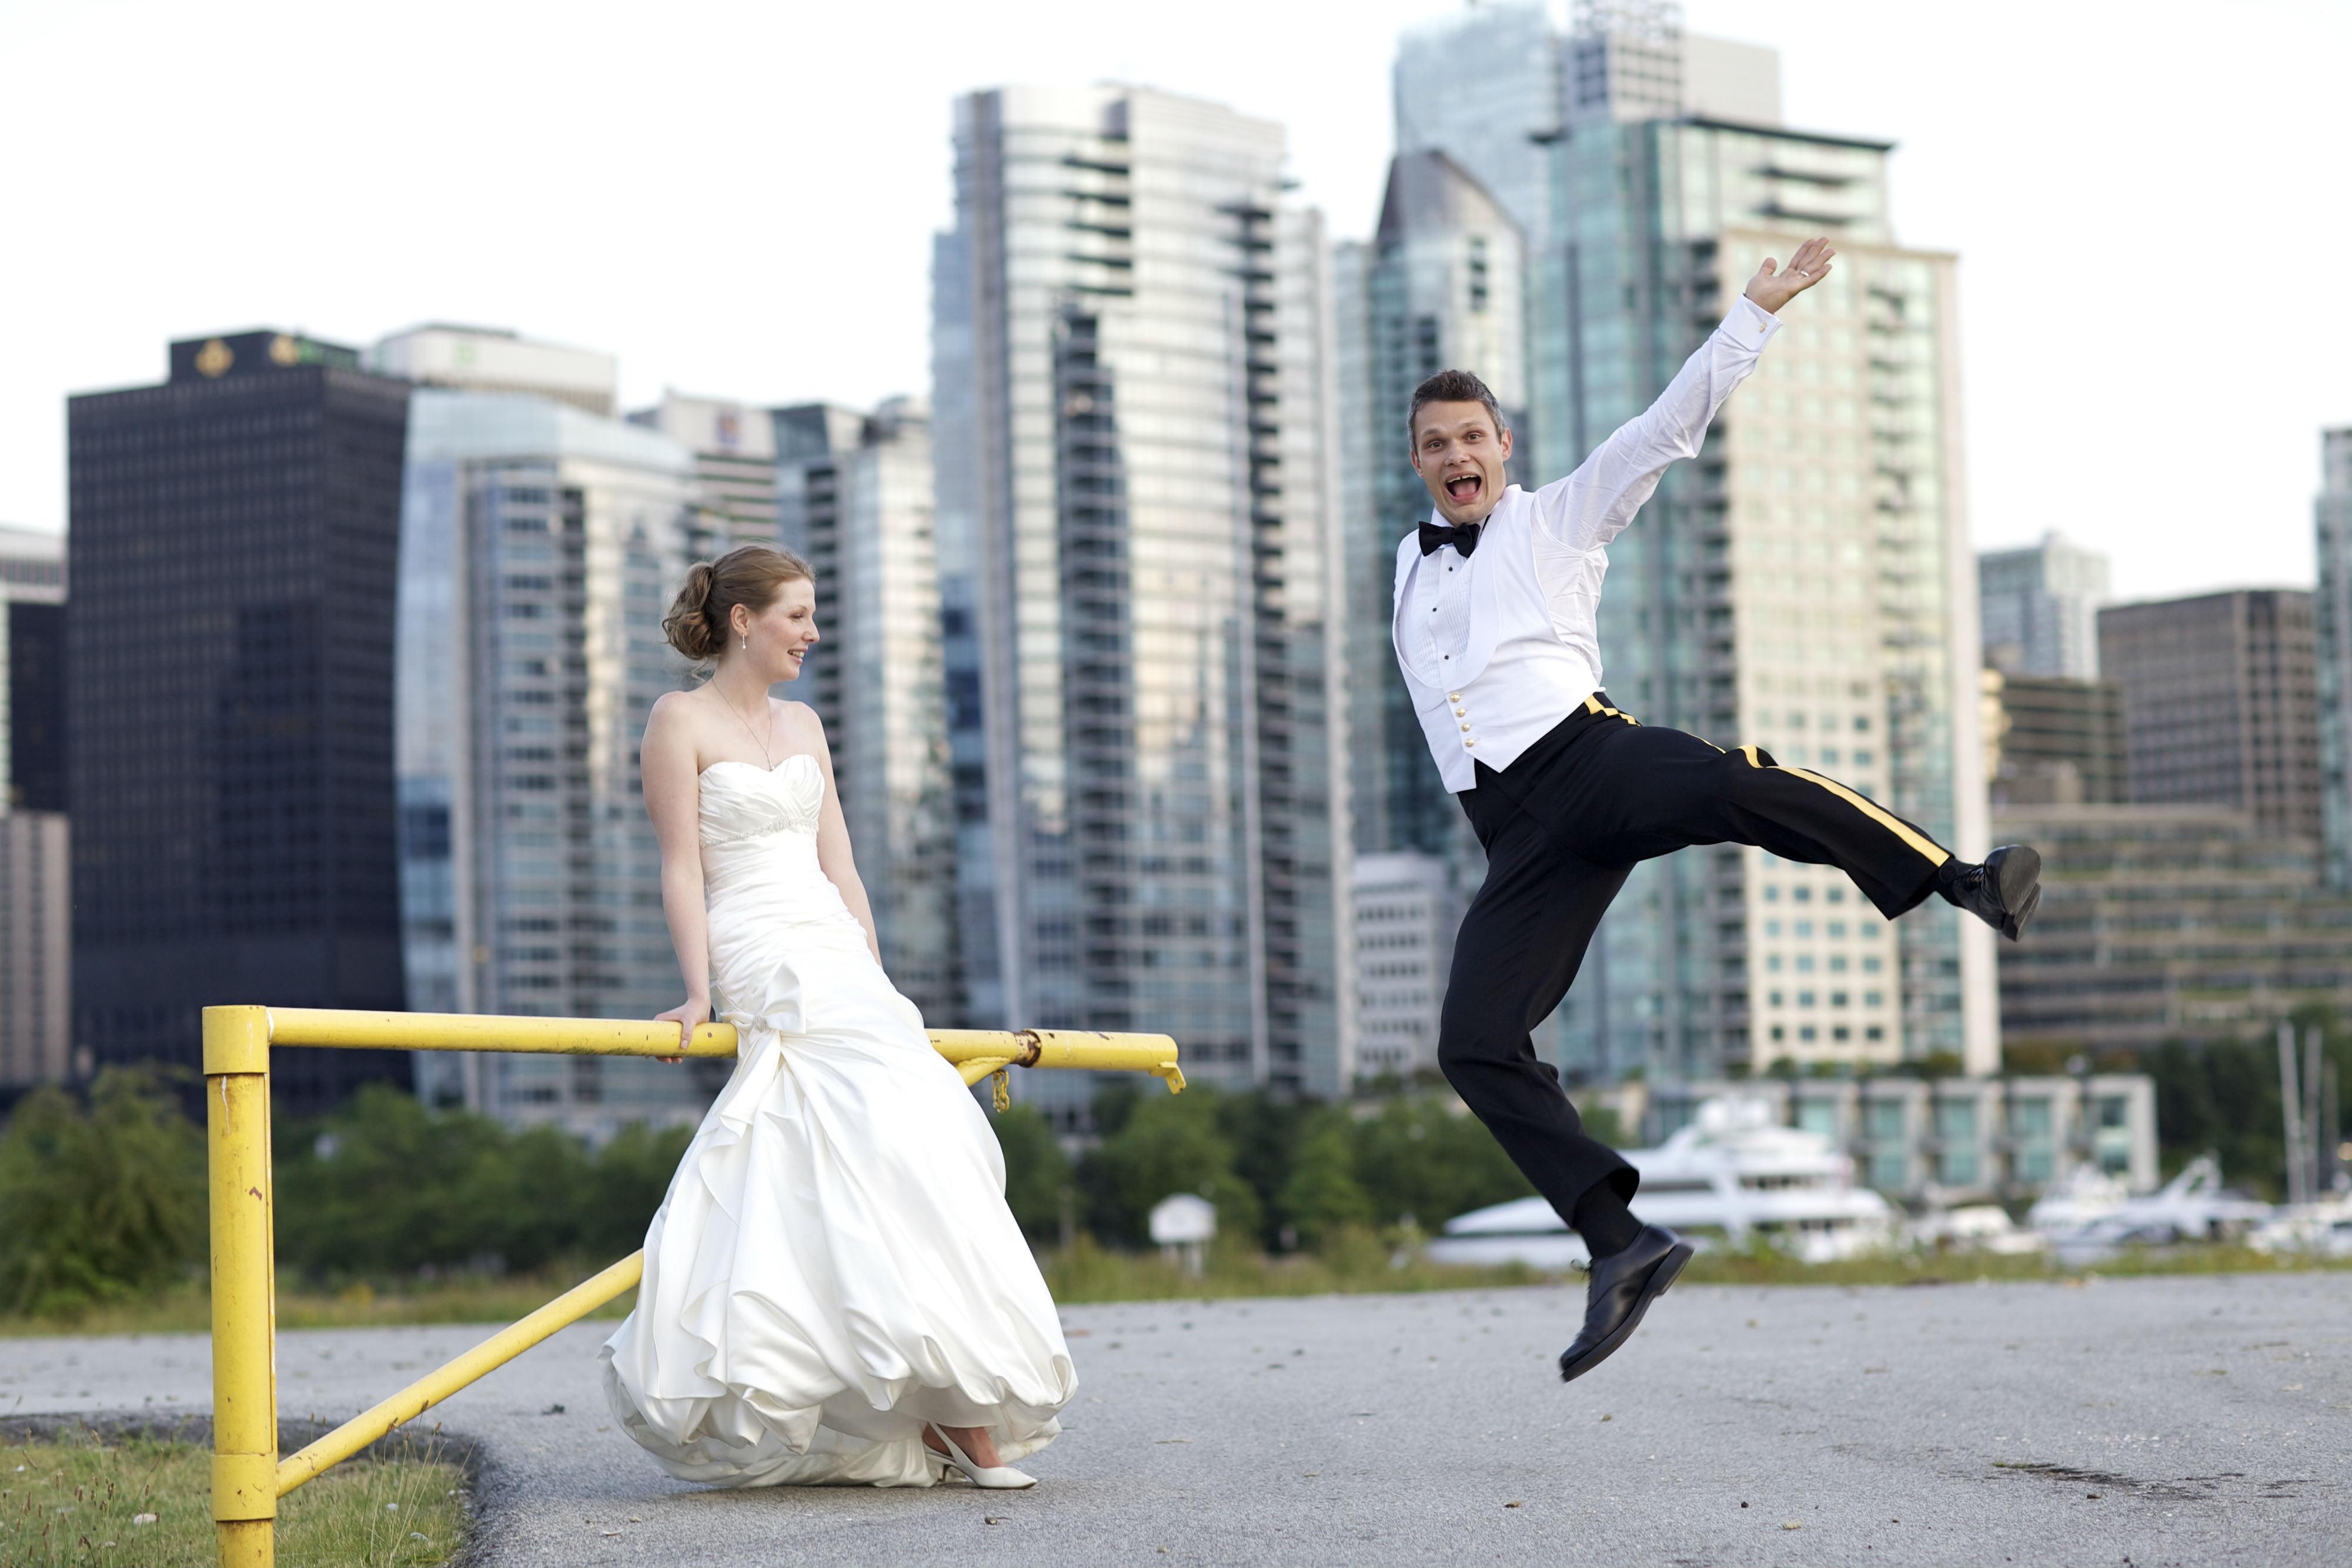 2-groom-jumping_1